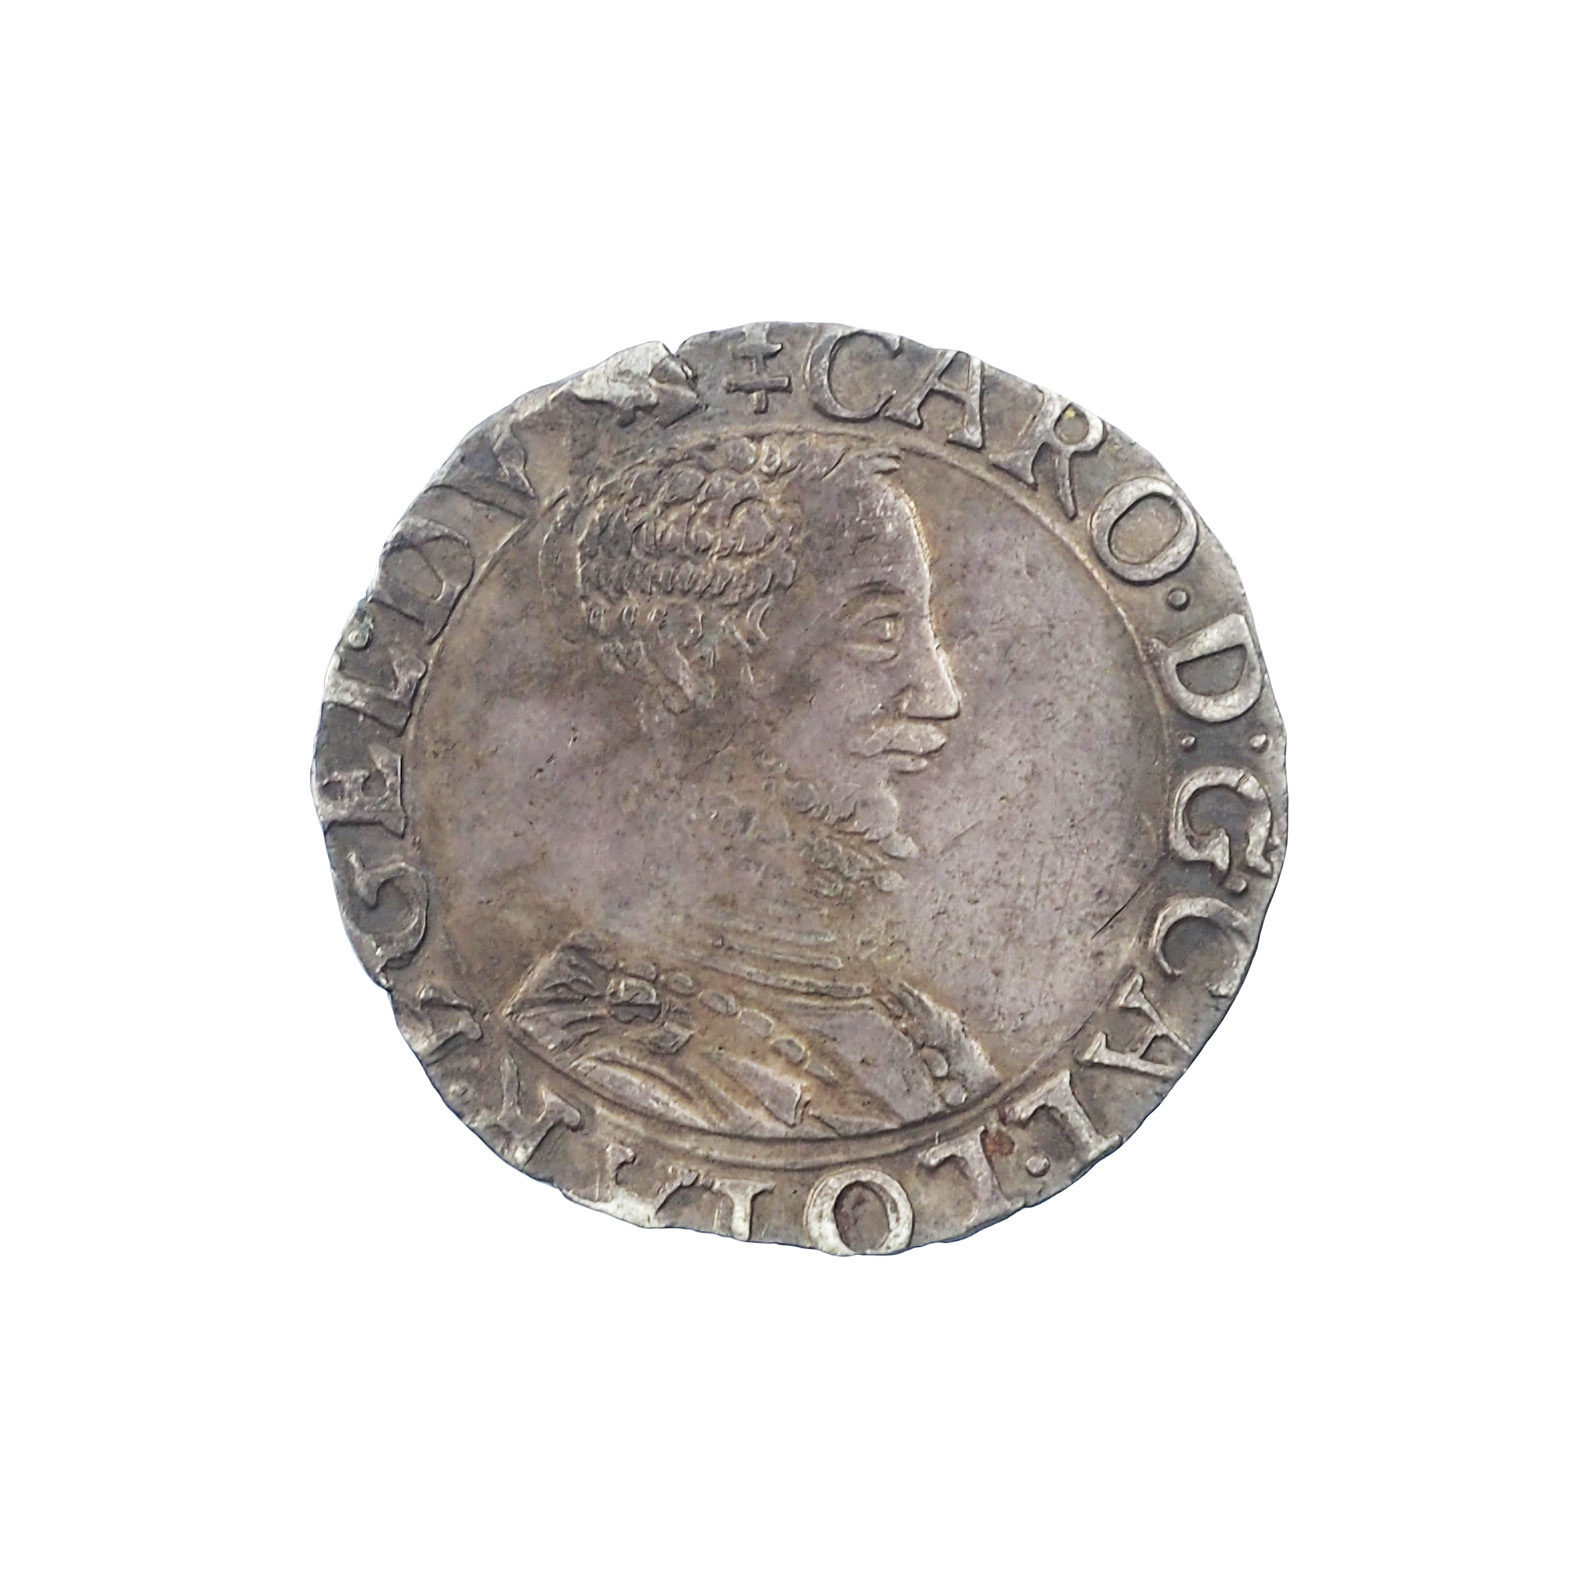 Lorraine, Charles III (1545-1608), 1/4 de teston, Nancy, Bd 1530, QUALITE !